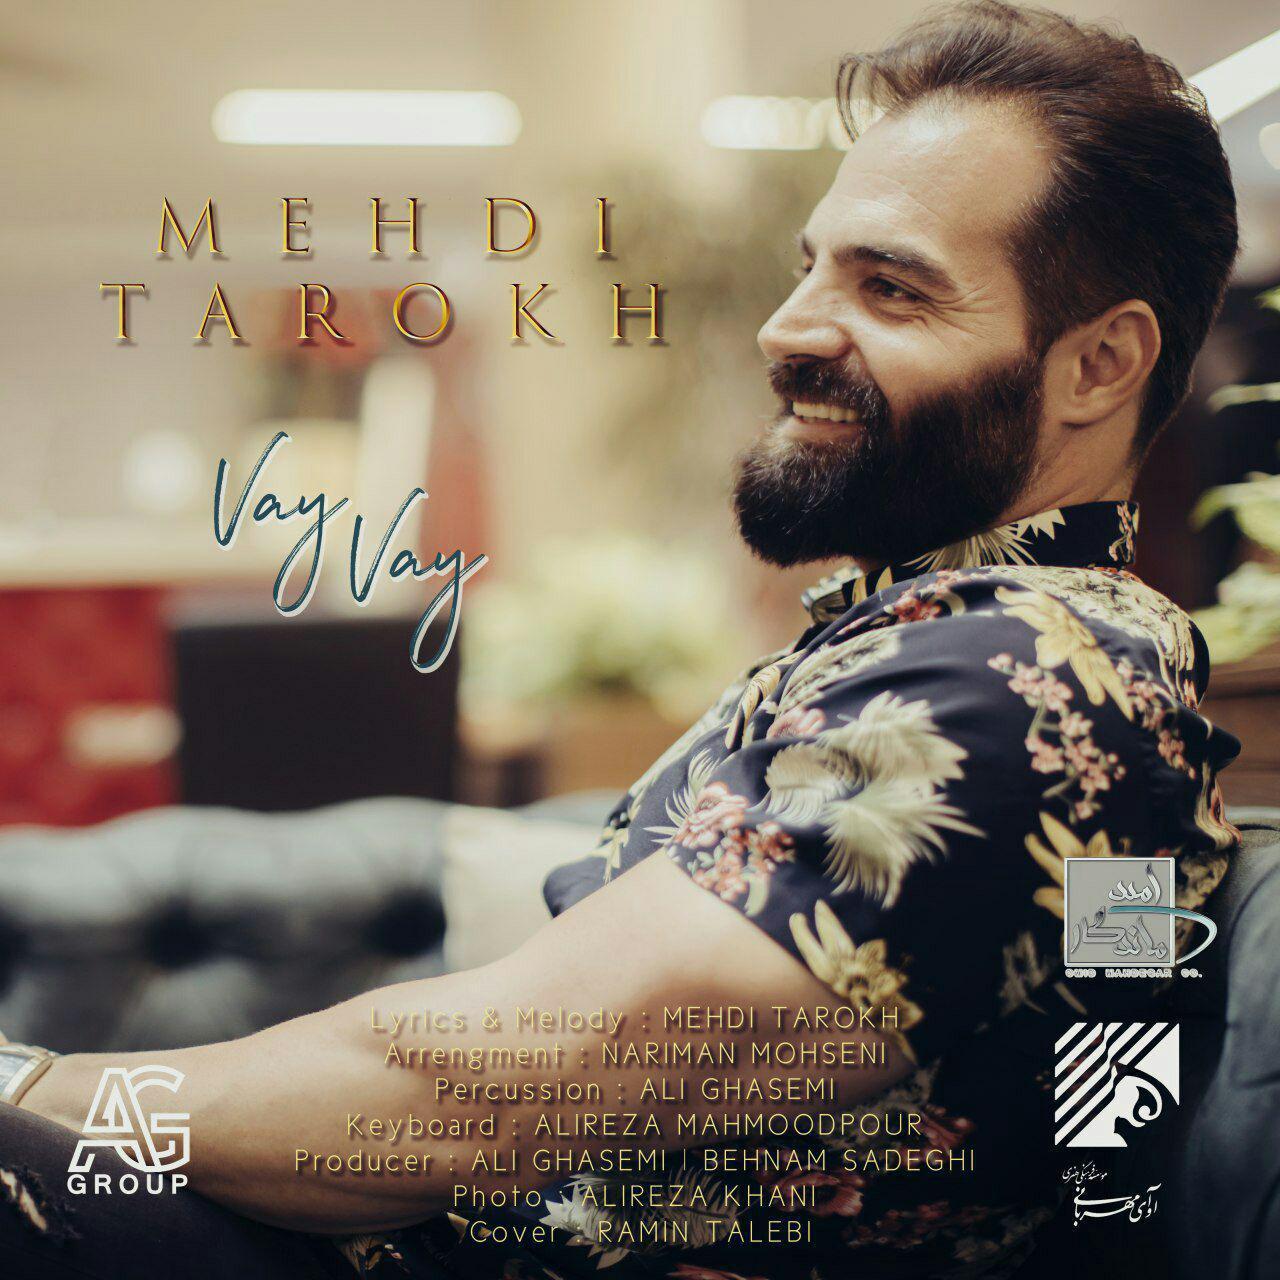 Mehdi Tarokh - Vay Vay Music | آهنگ مهدی تارخ - وای وای